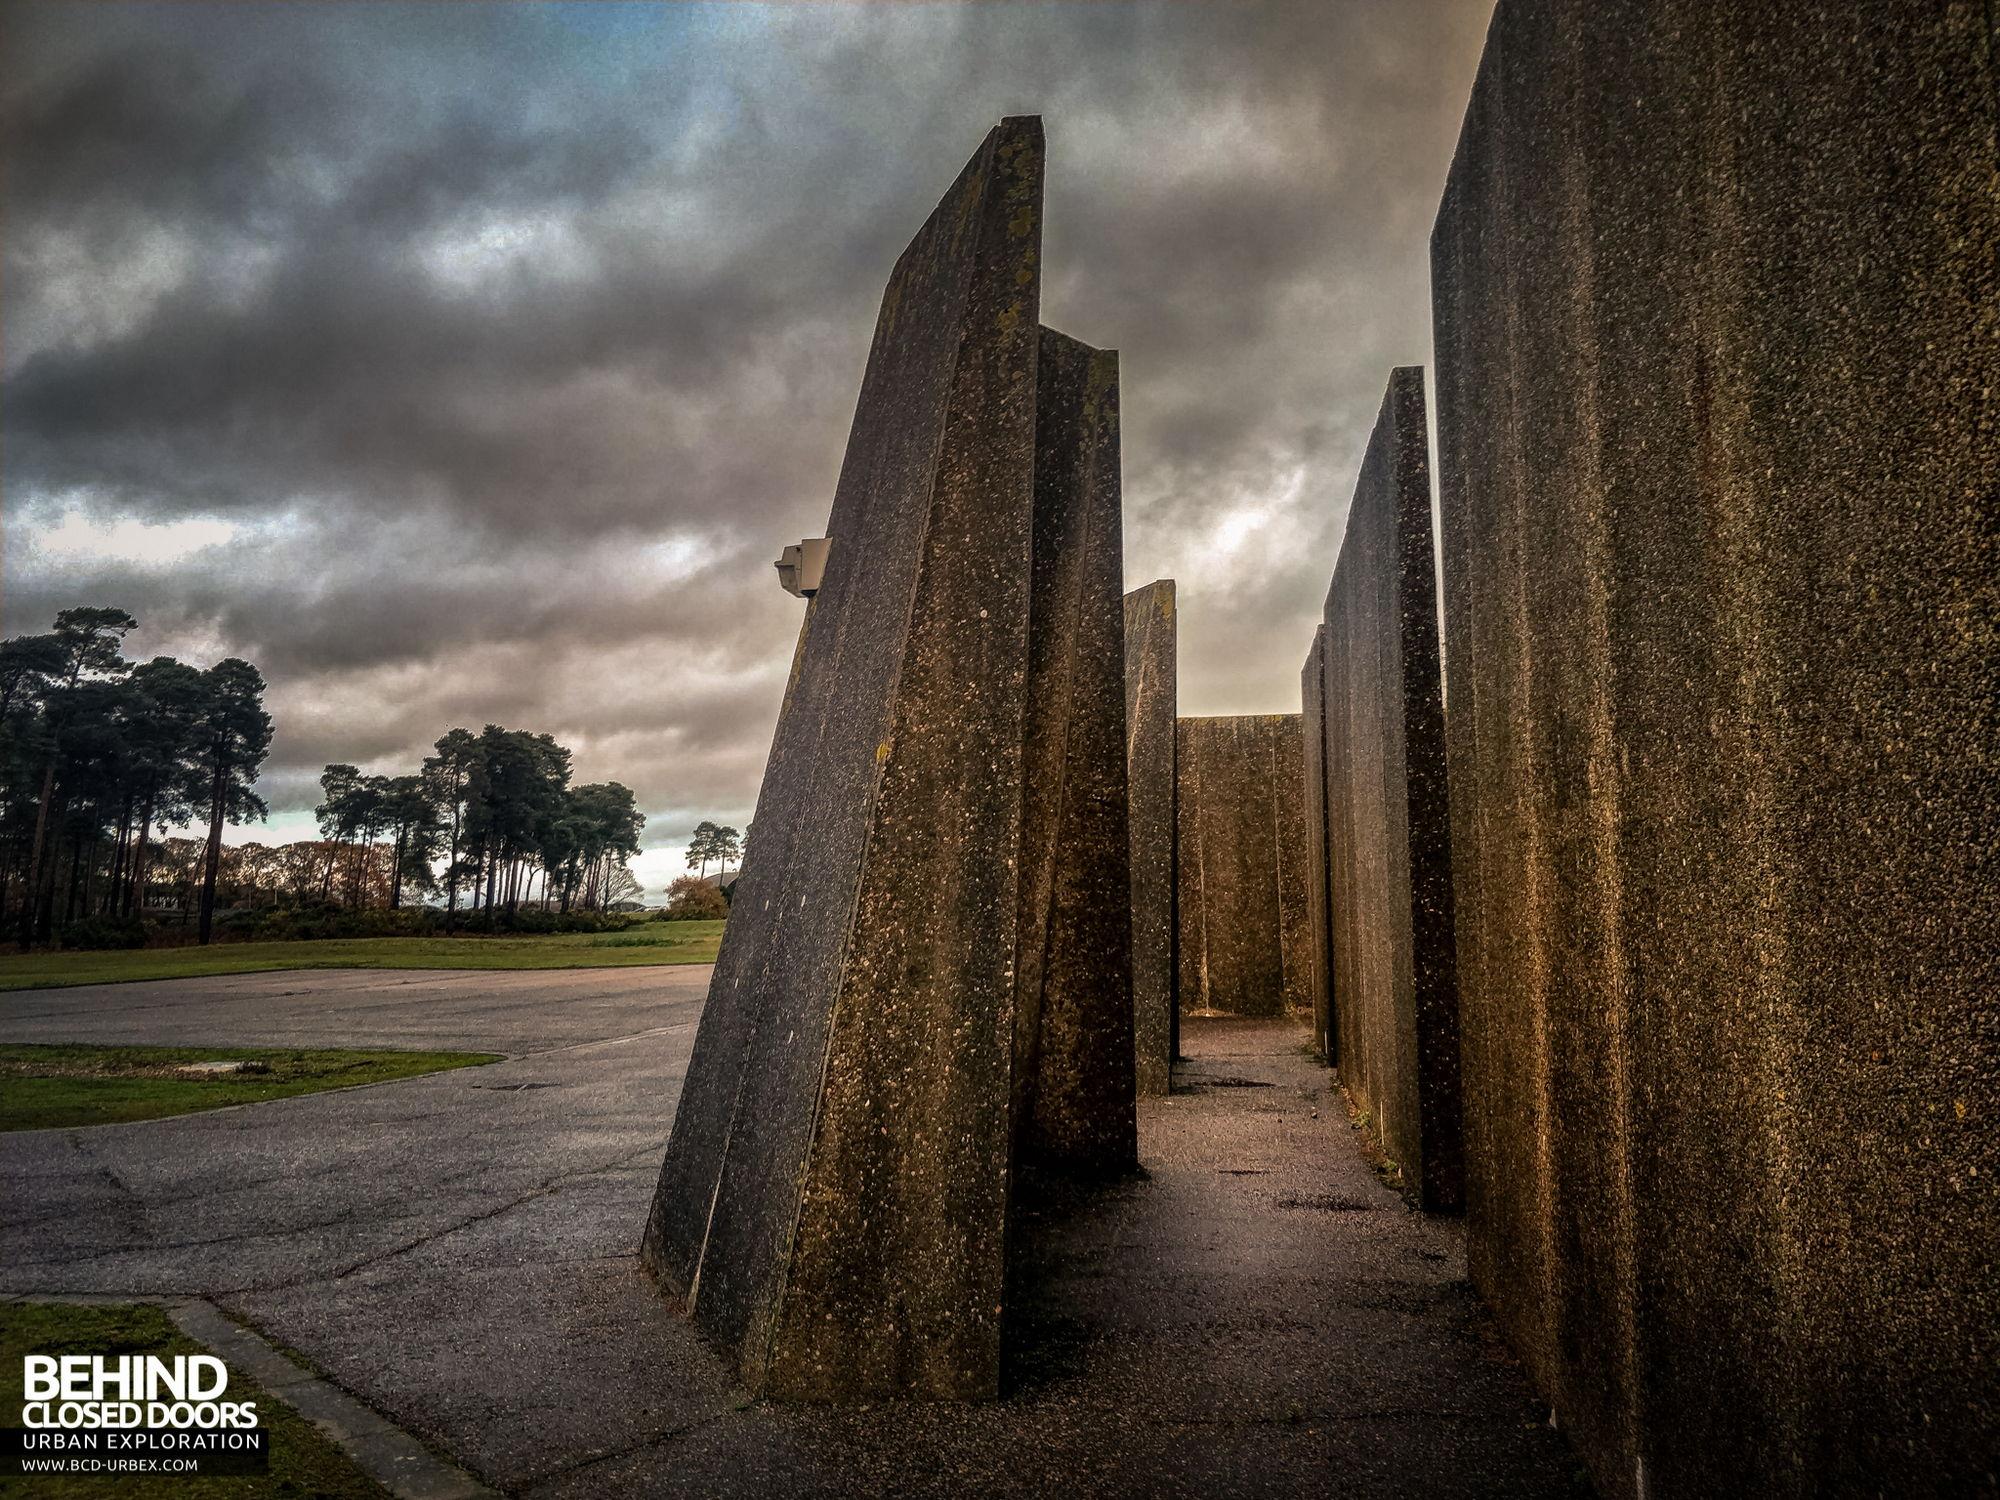 RAF Bentwaters - Concrete blast walls